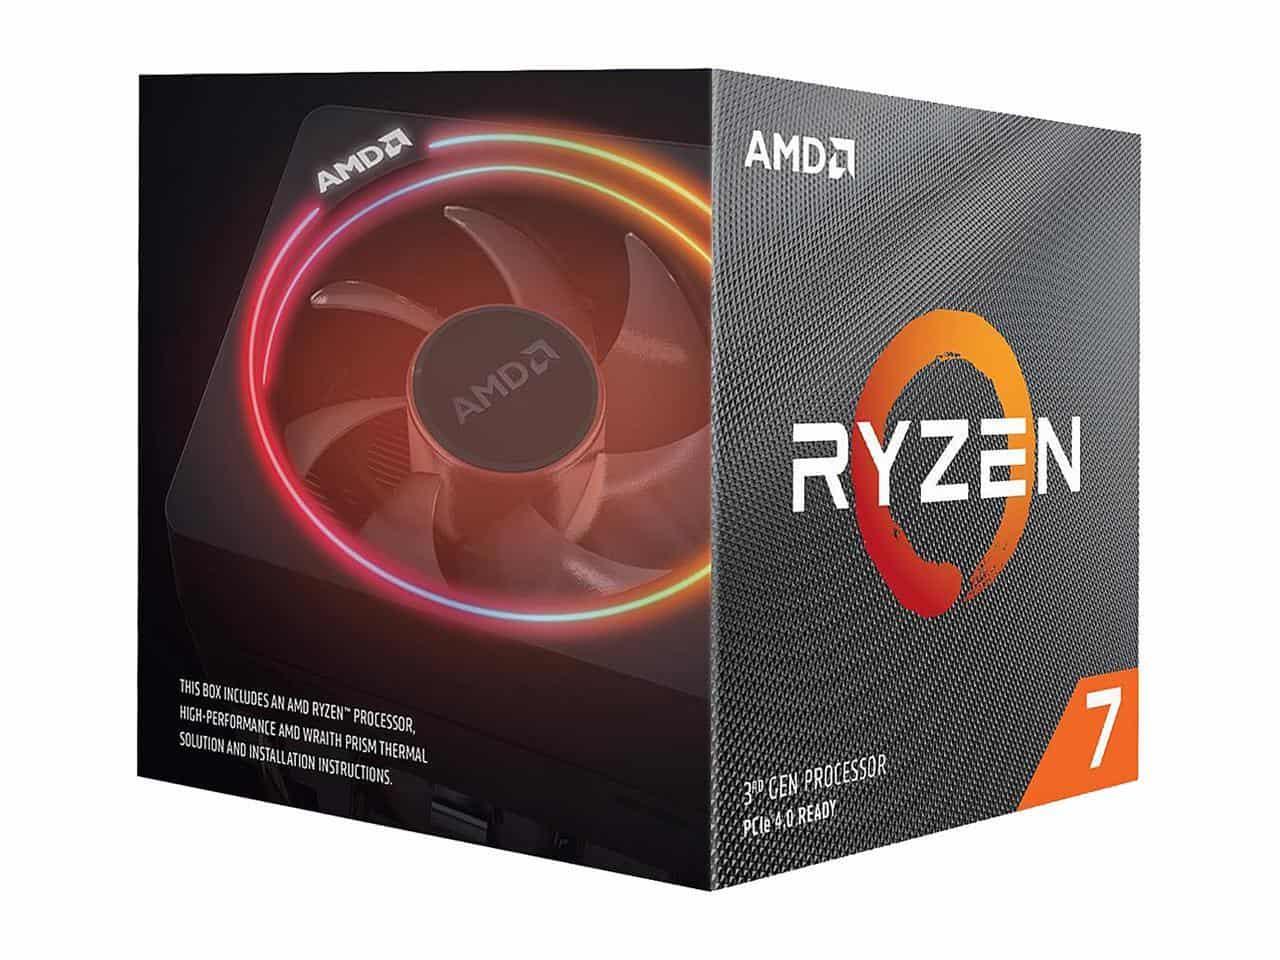 AMD Ryzen 7 3700X: An energy efficient option for video